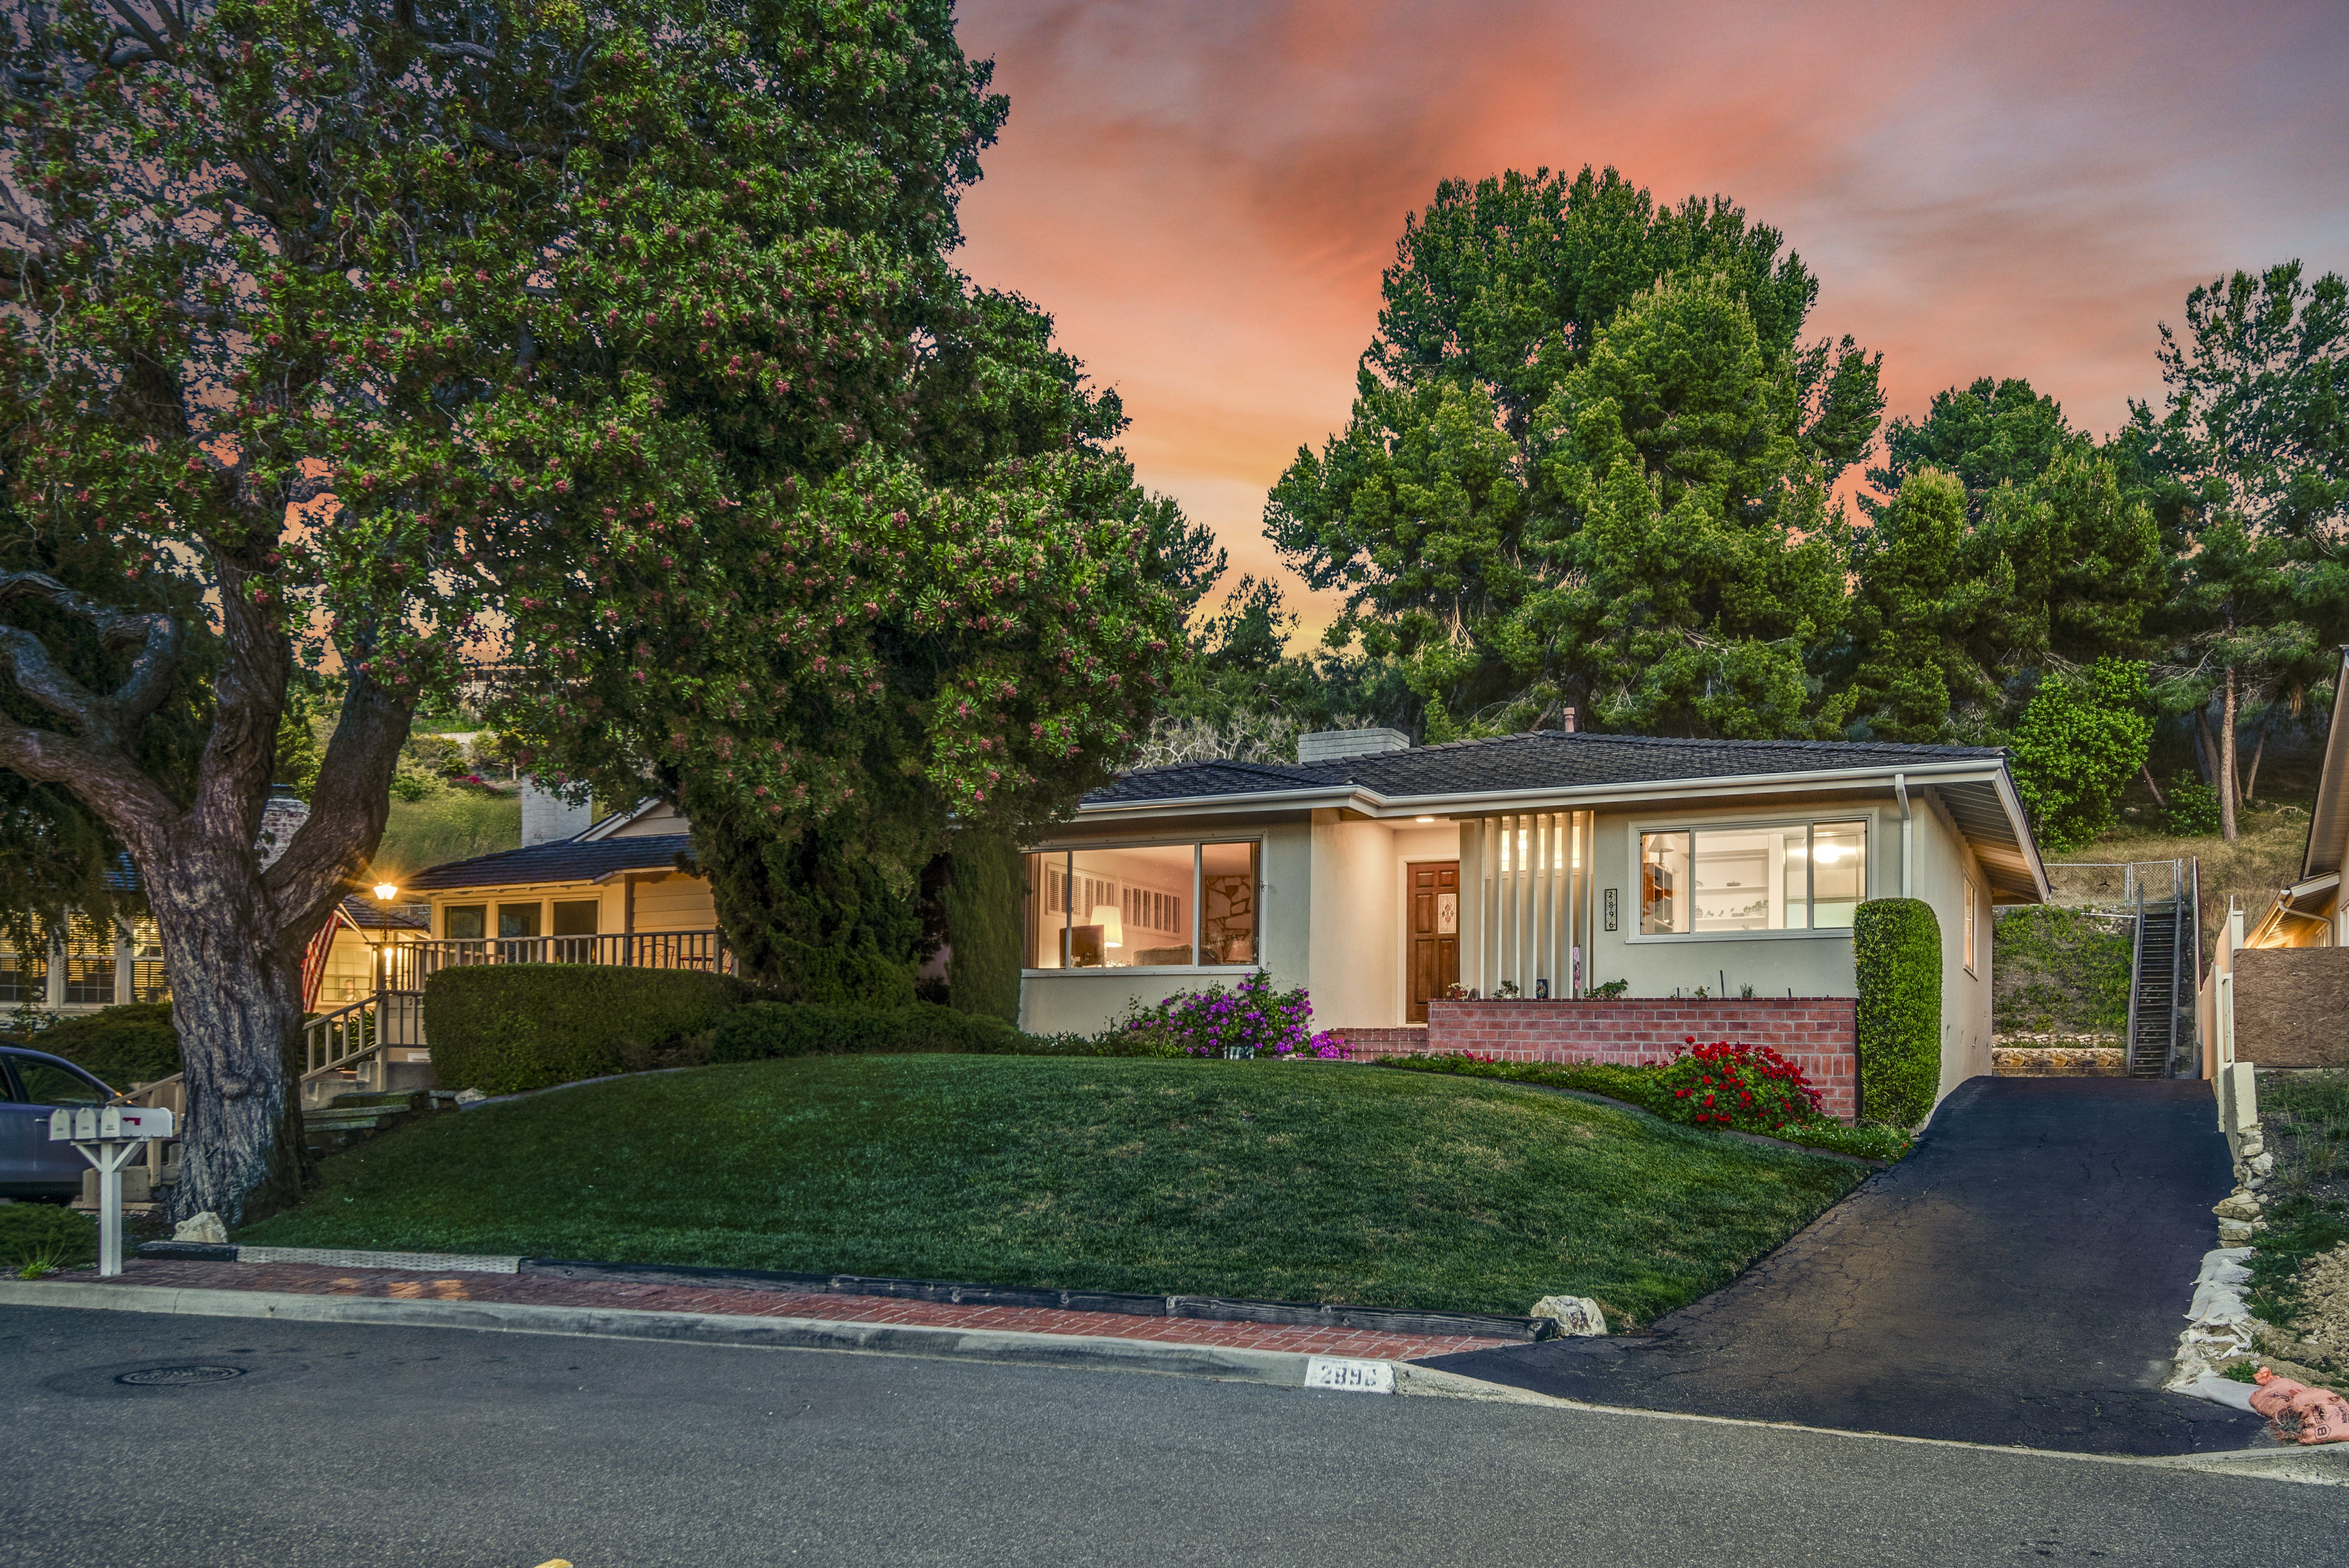 Charming Single Family Home in Palos Verdes Estates